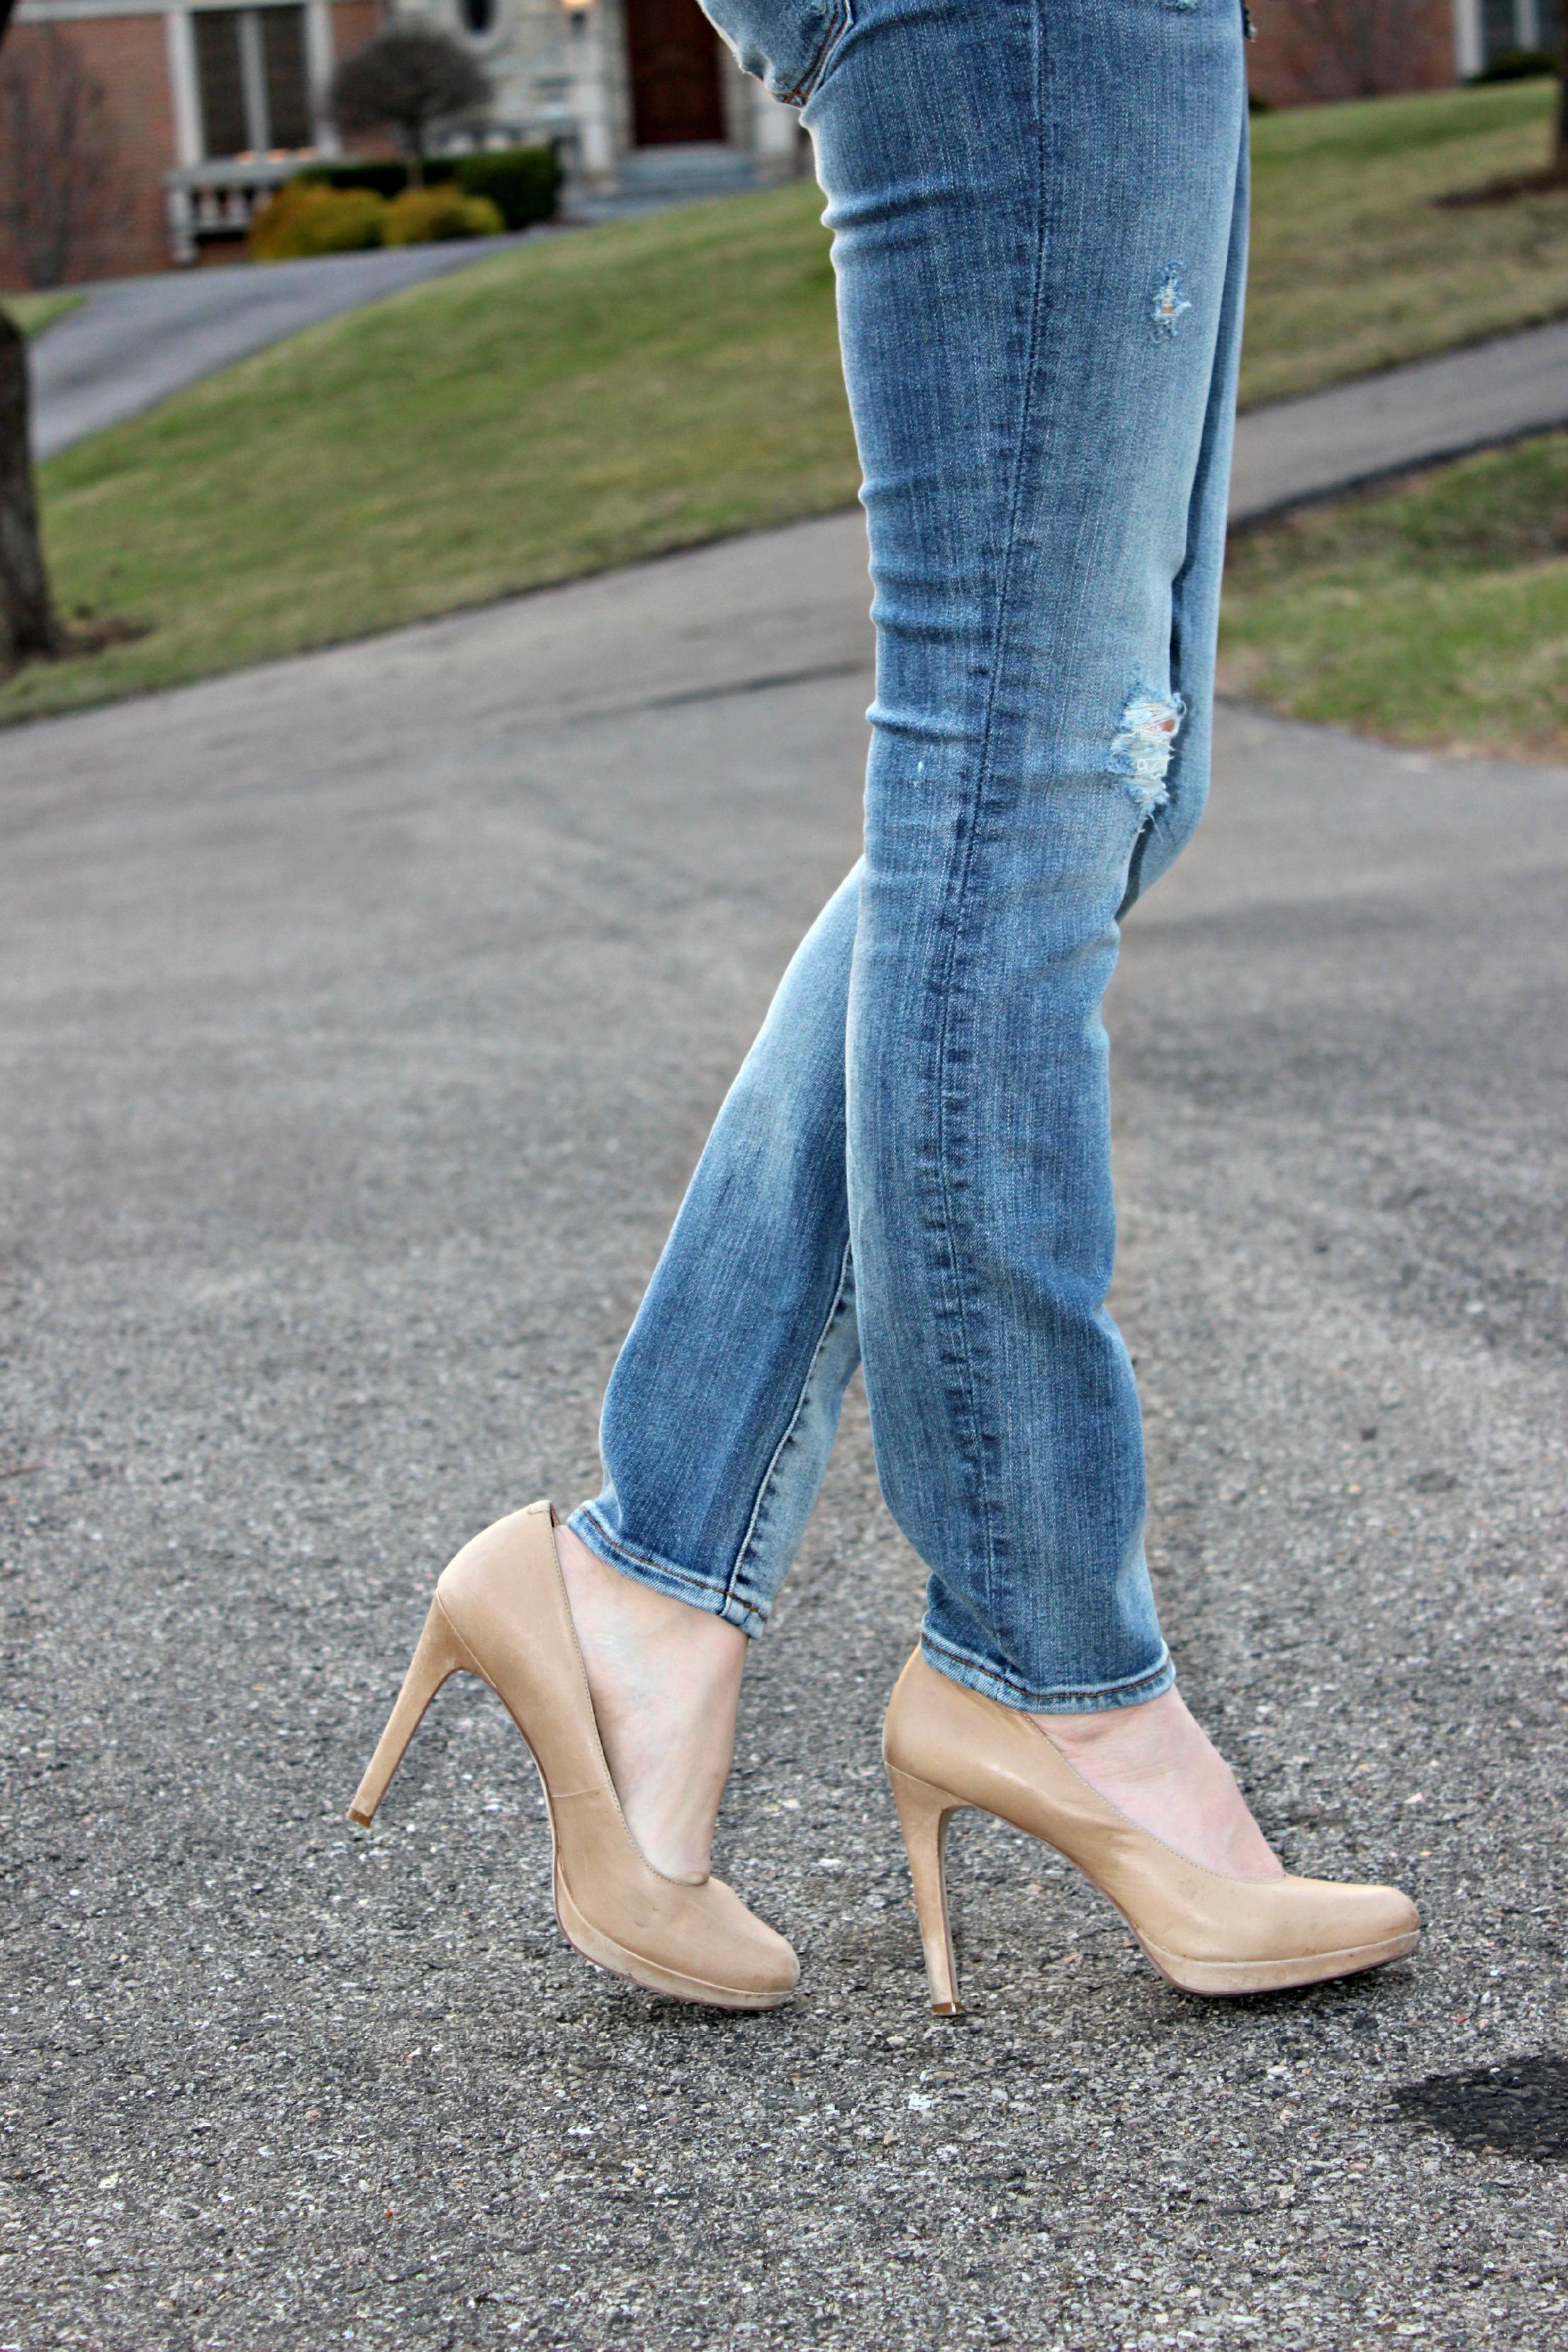 Distressed Gap Jeans BCBGeneration Heels